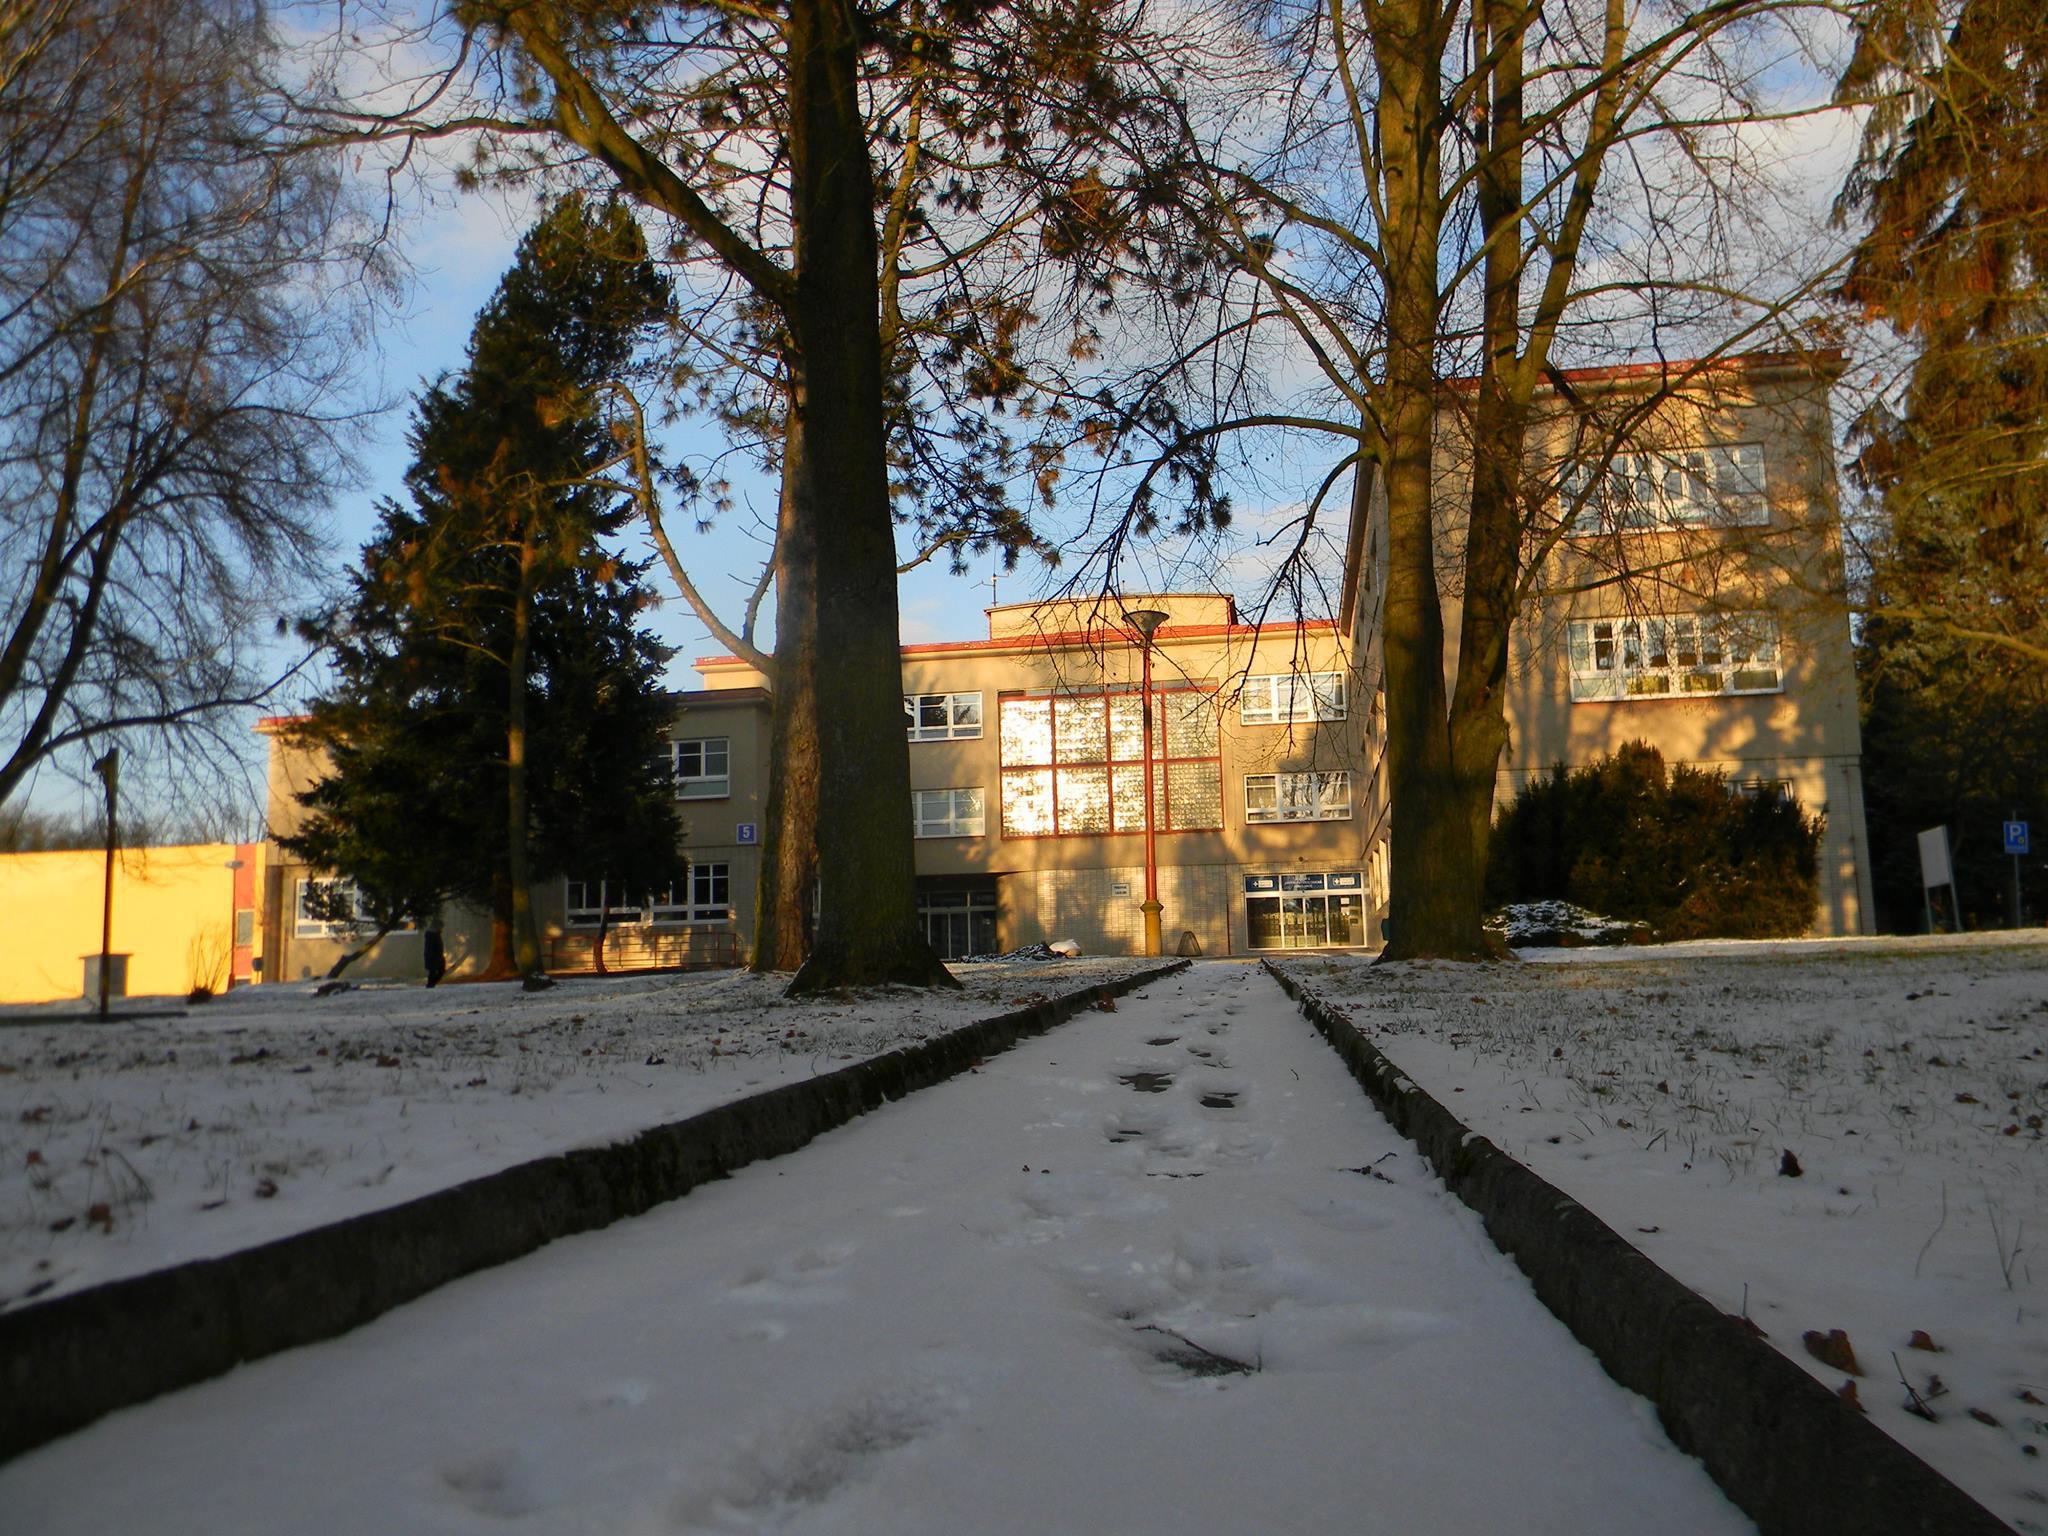 Nemocnice Dačice, a.s.